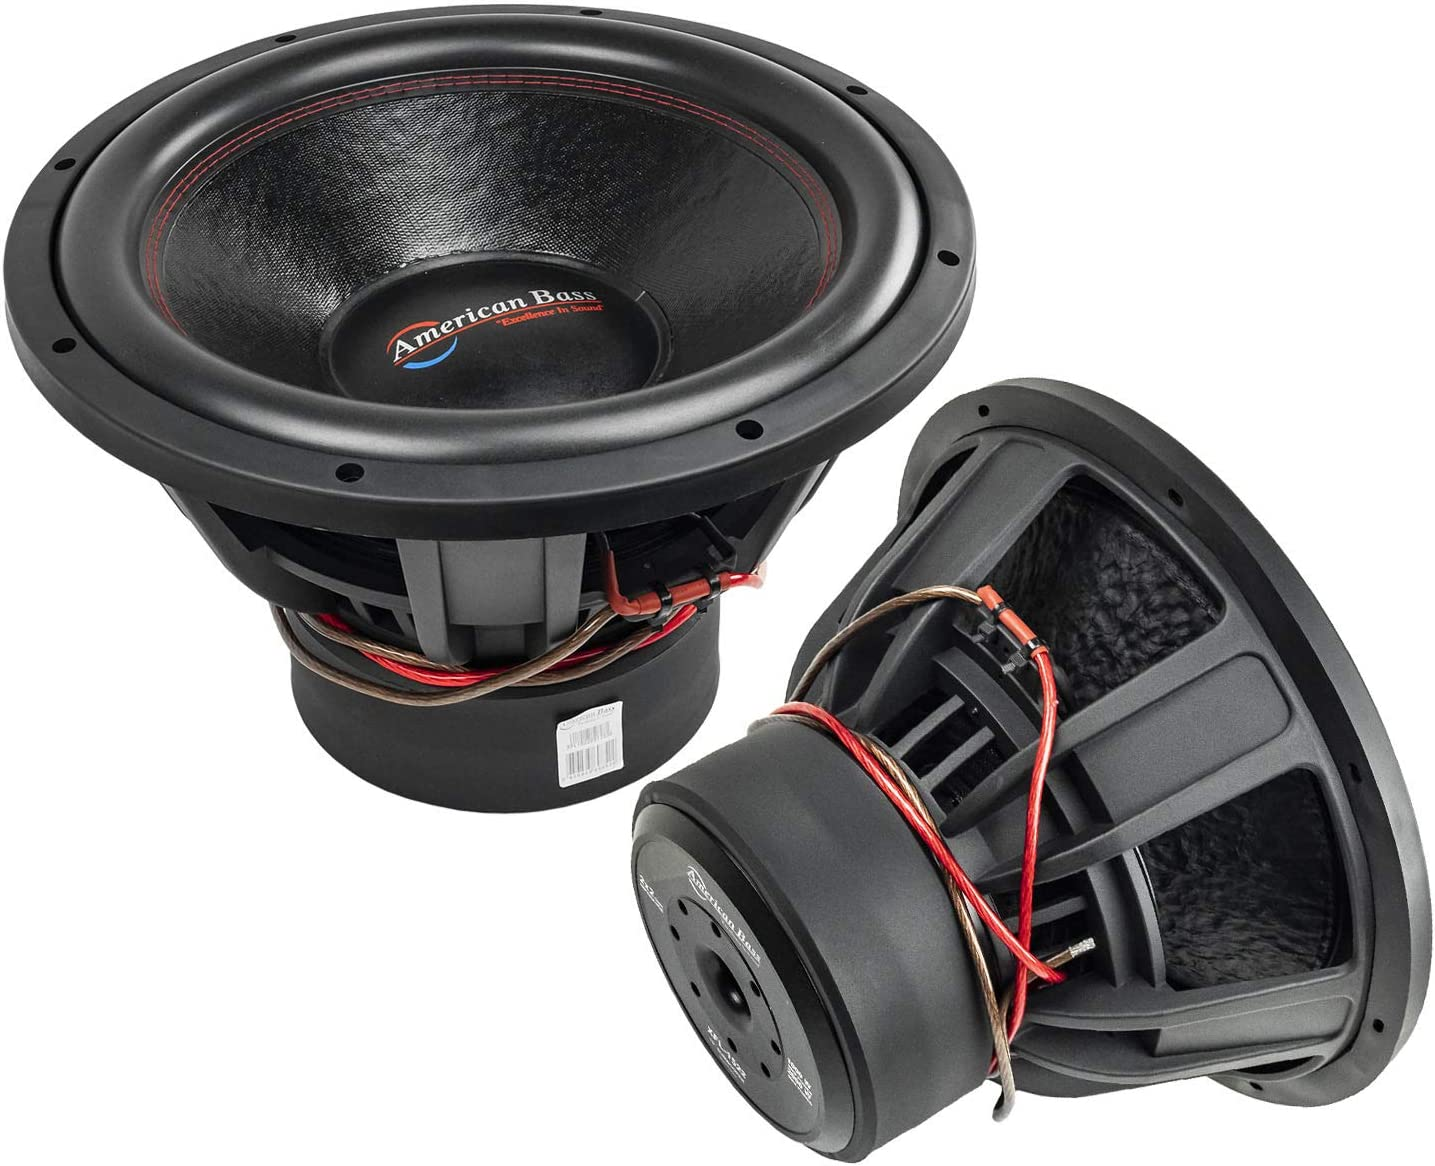 American Bass XFL-1522 15